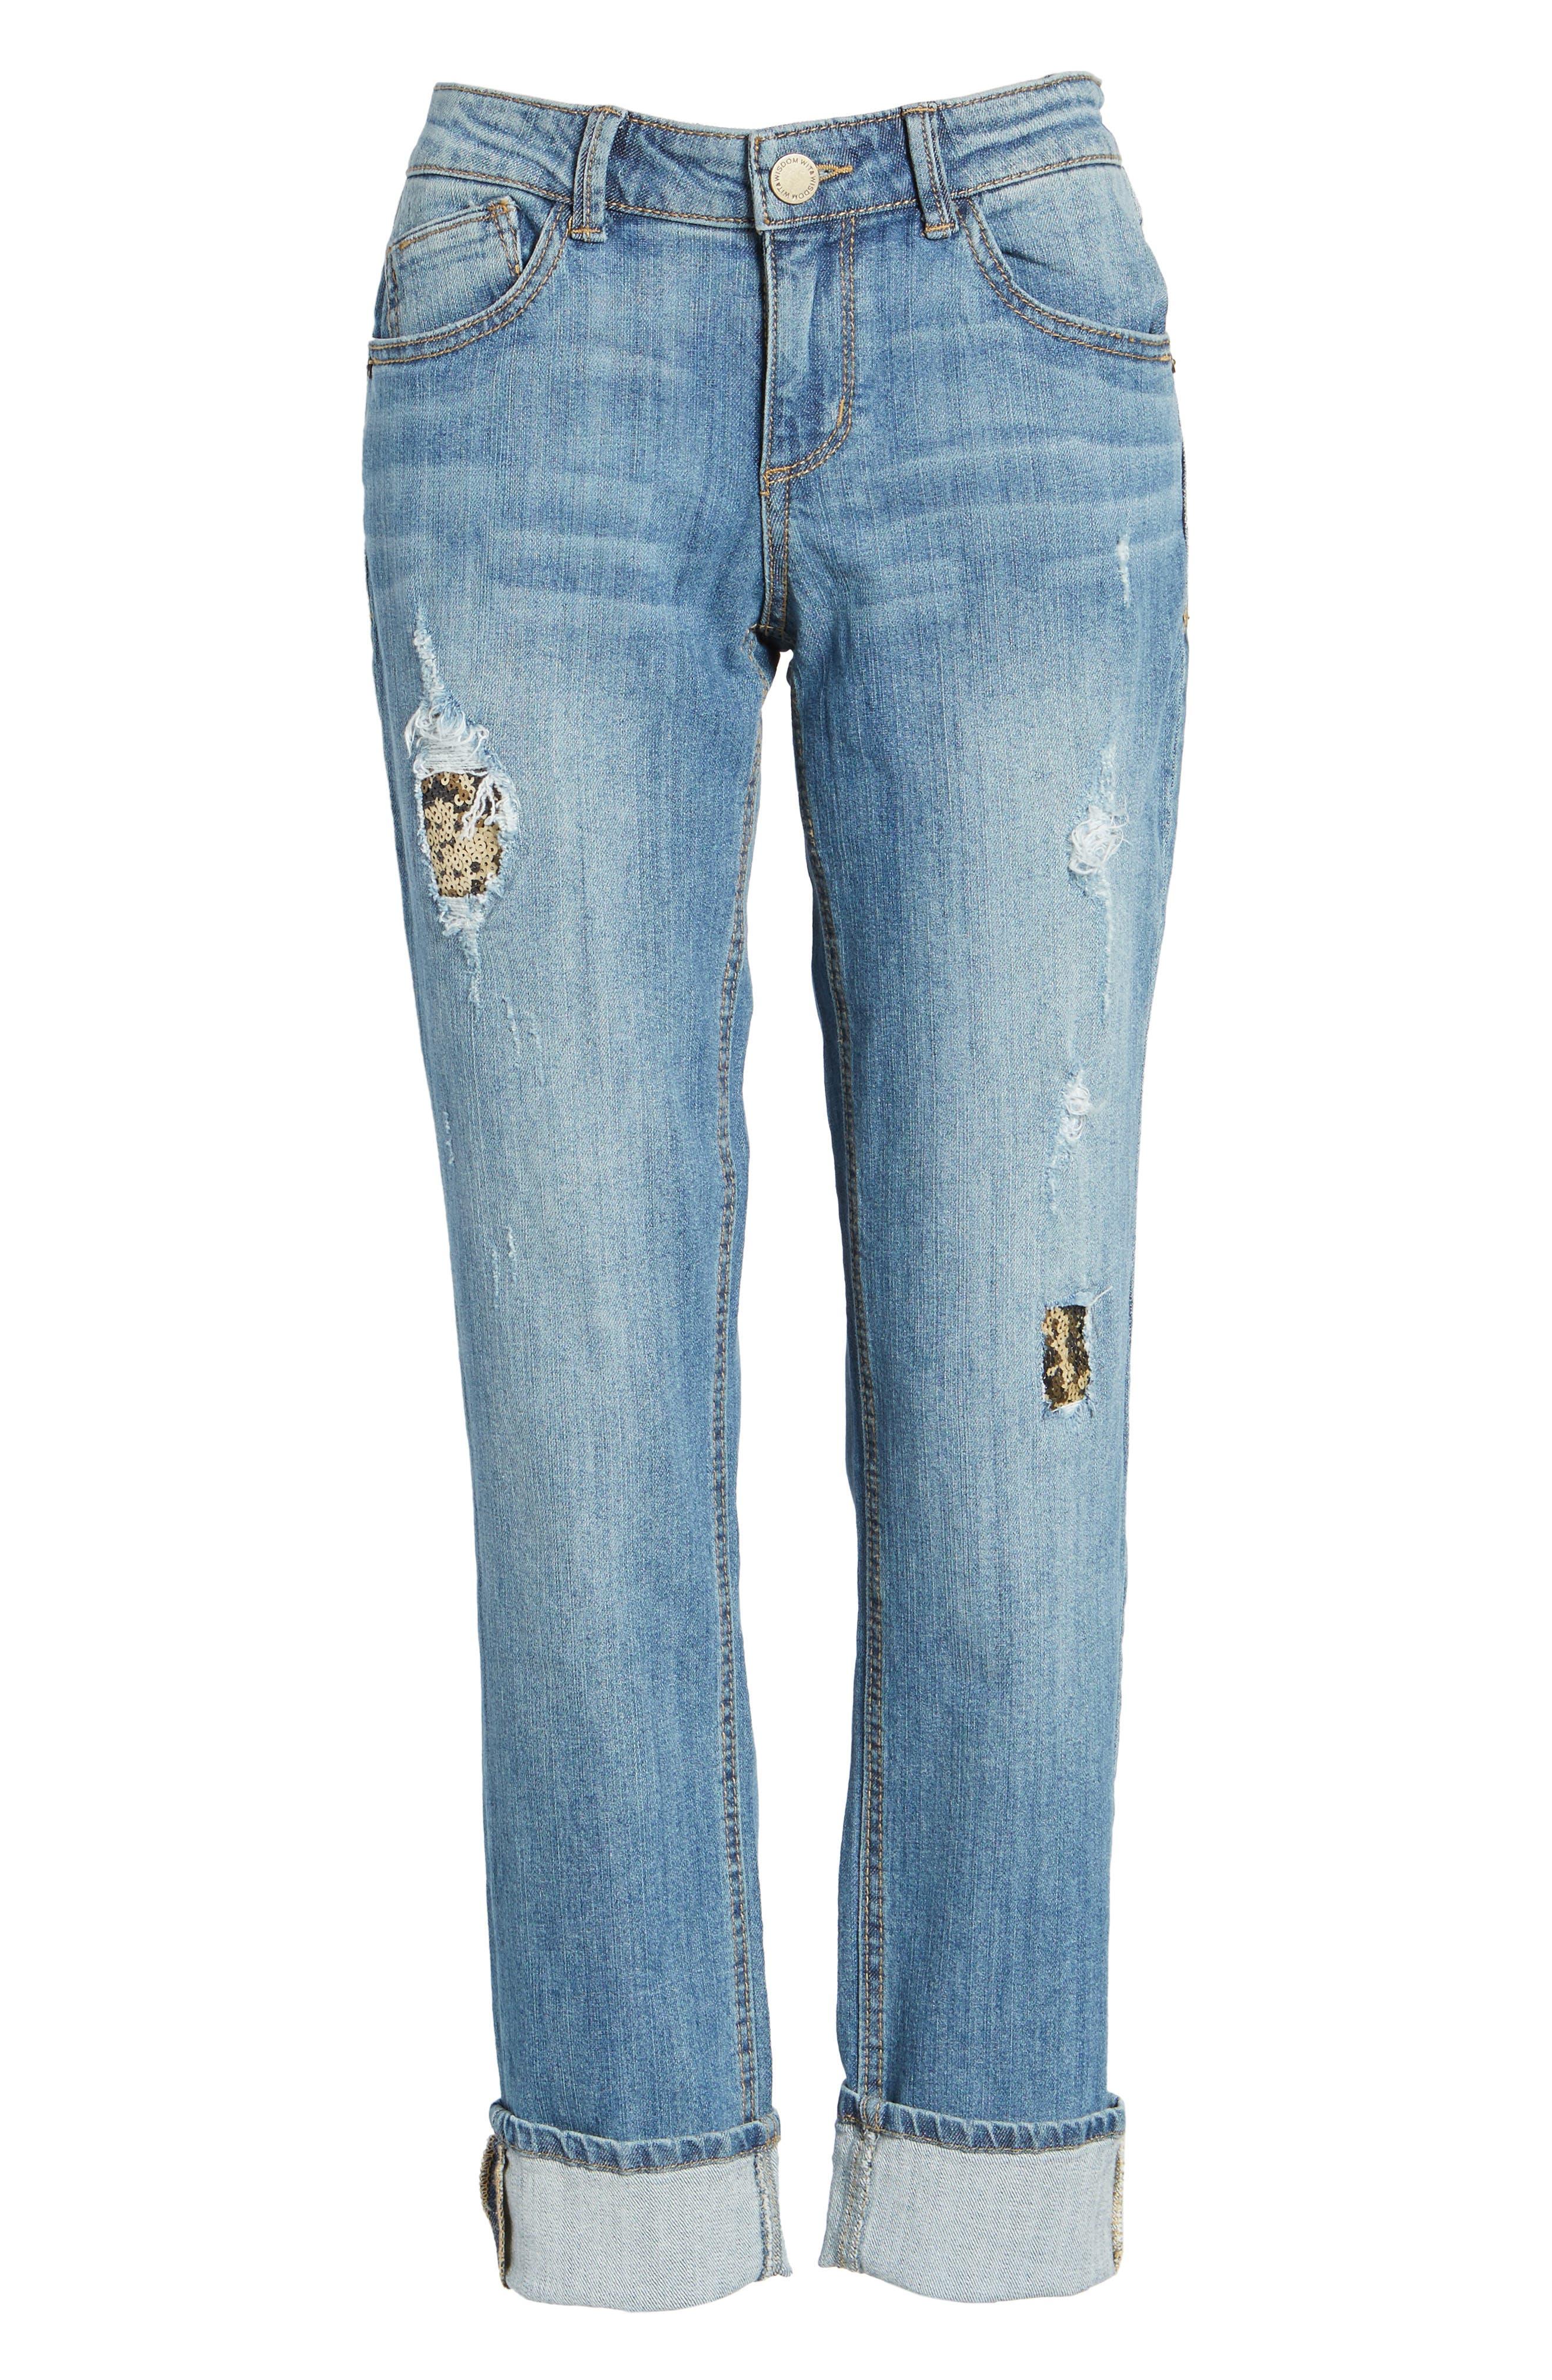 Flexellent Skinny Girlfriend Jeans,                             Alternate thumbnail 6, color,                             458